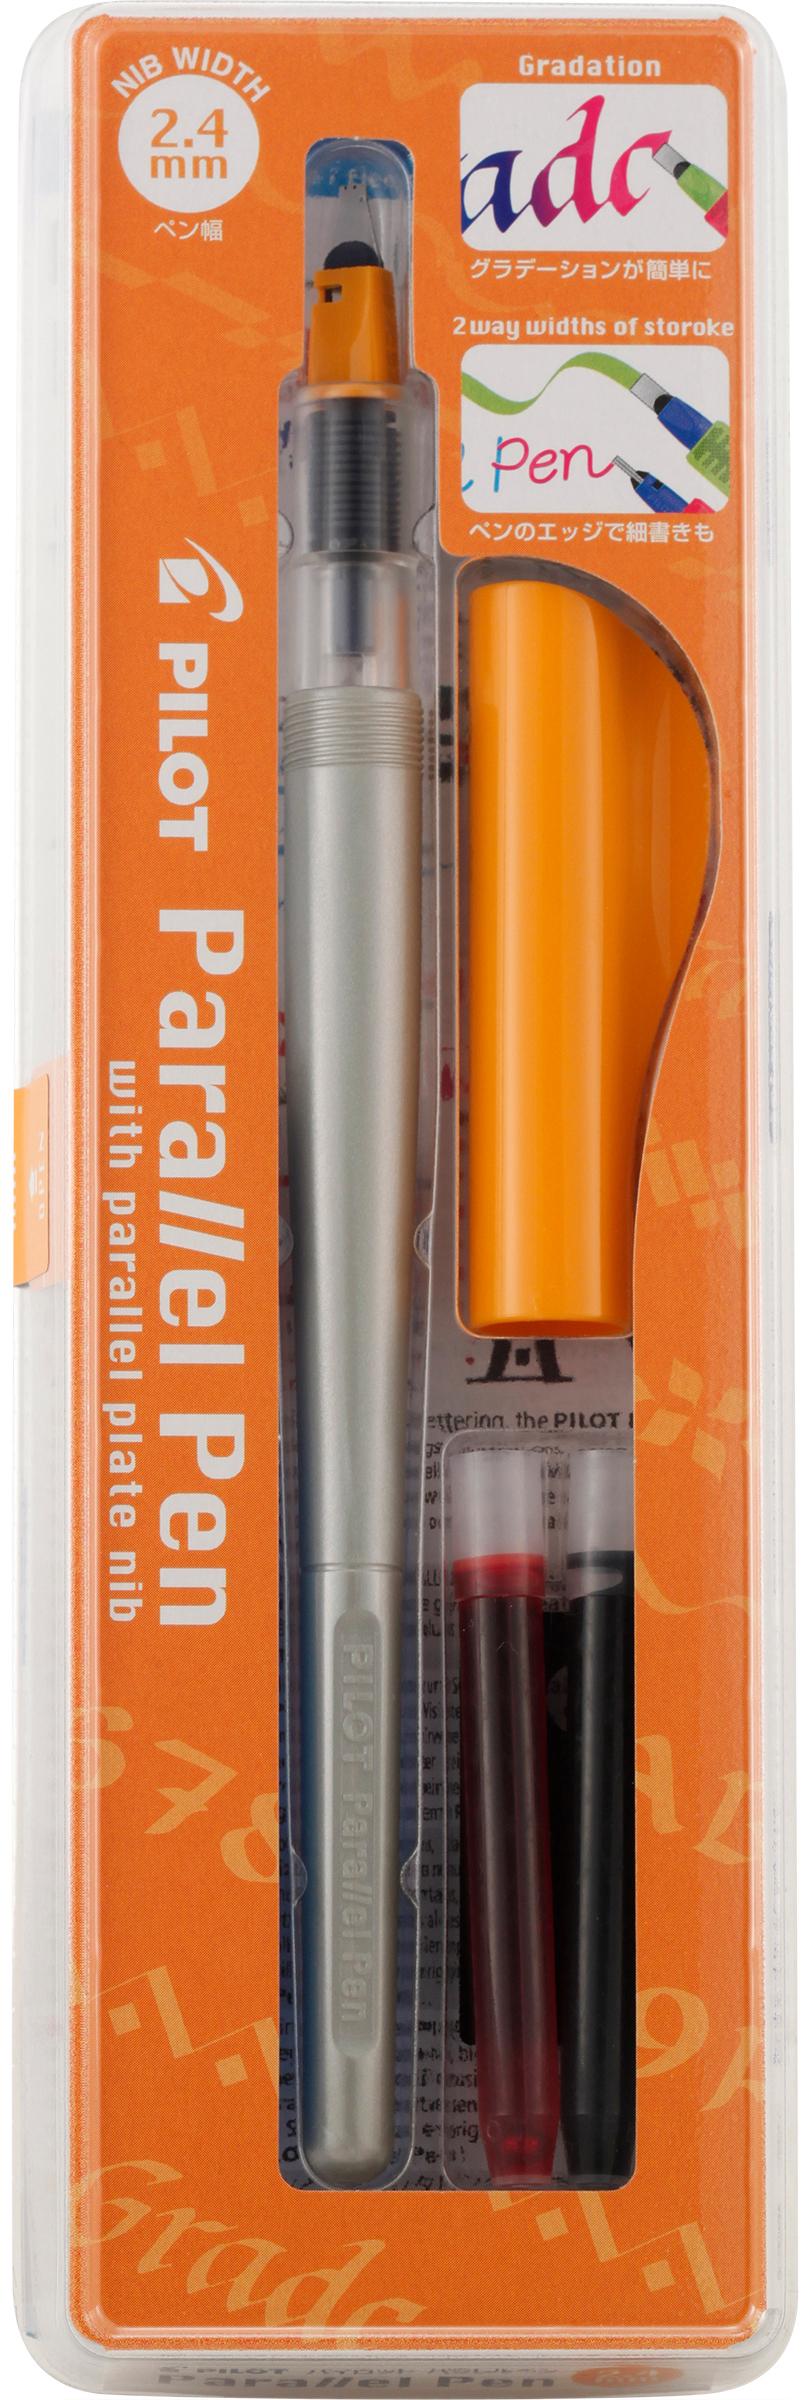 Pilot Parallel Calligraphy Pen Set 2.4mm Nib-Black & Red Ink